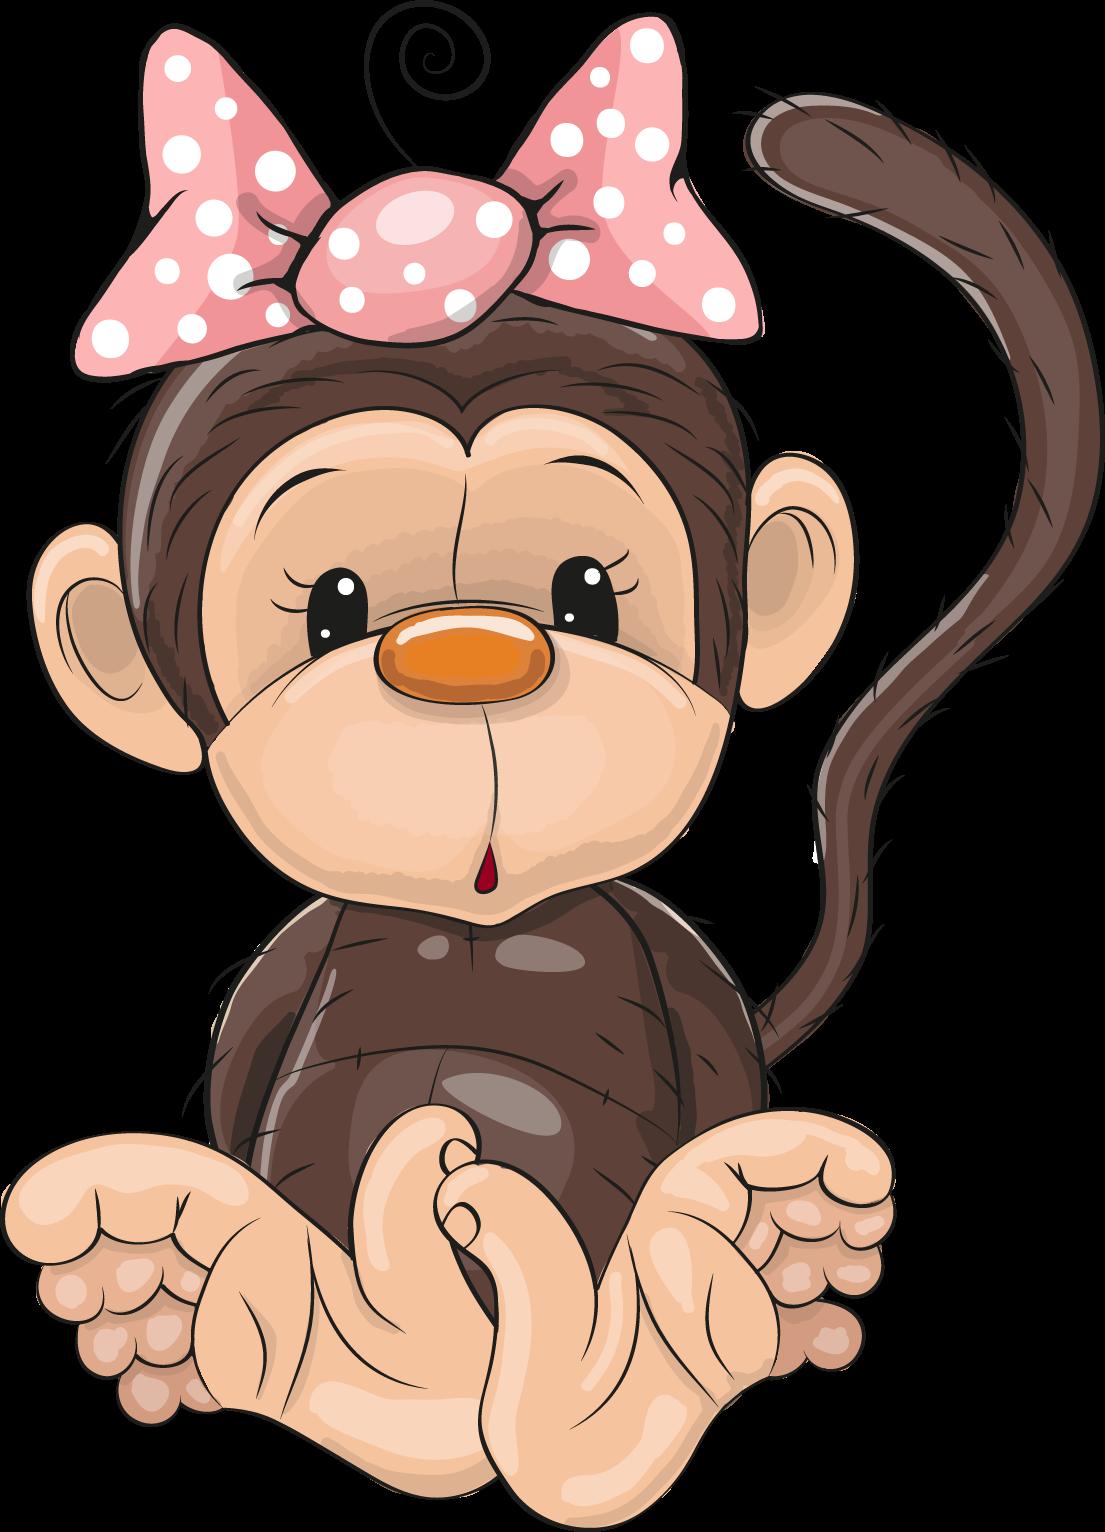 Днем, обезьянки картинки нарисованные